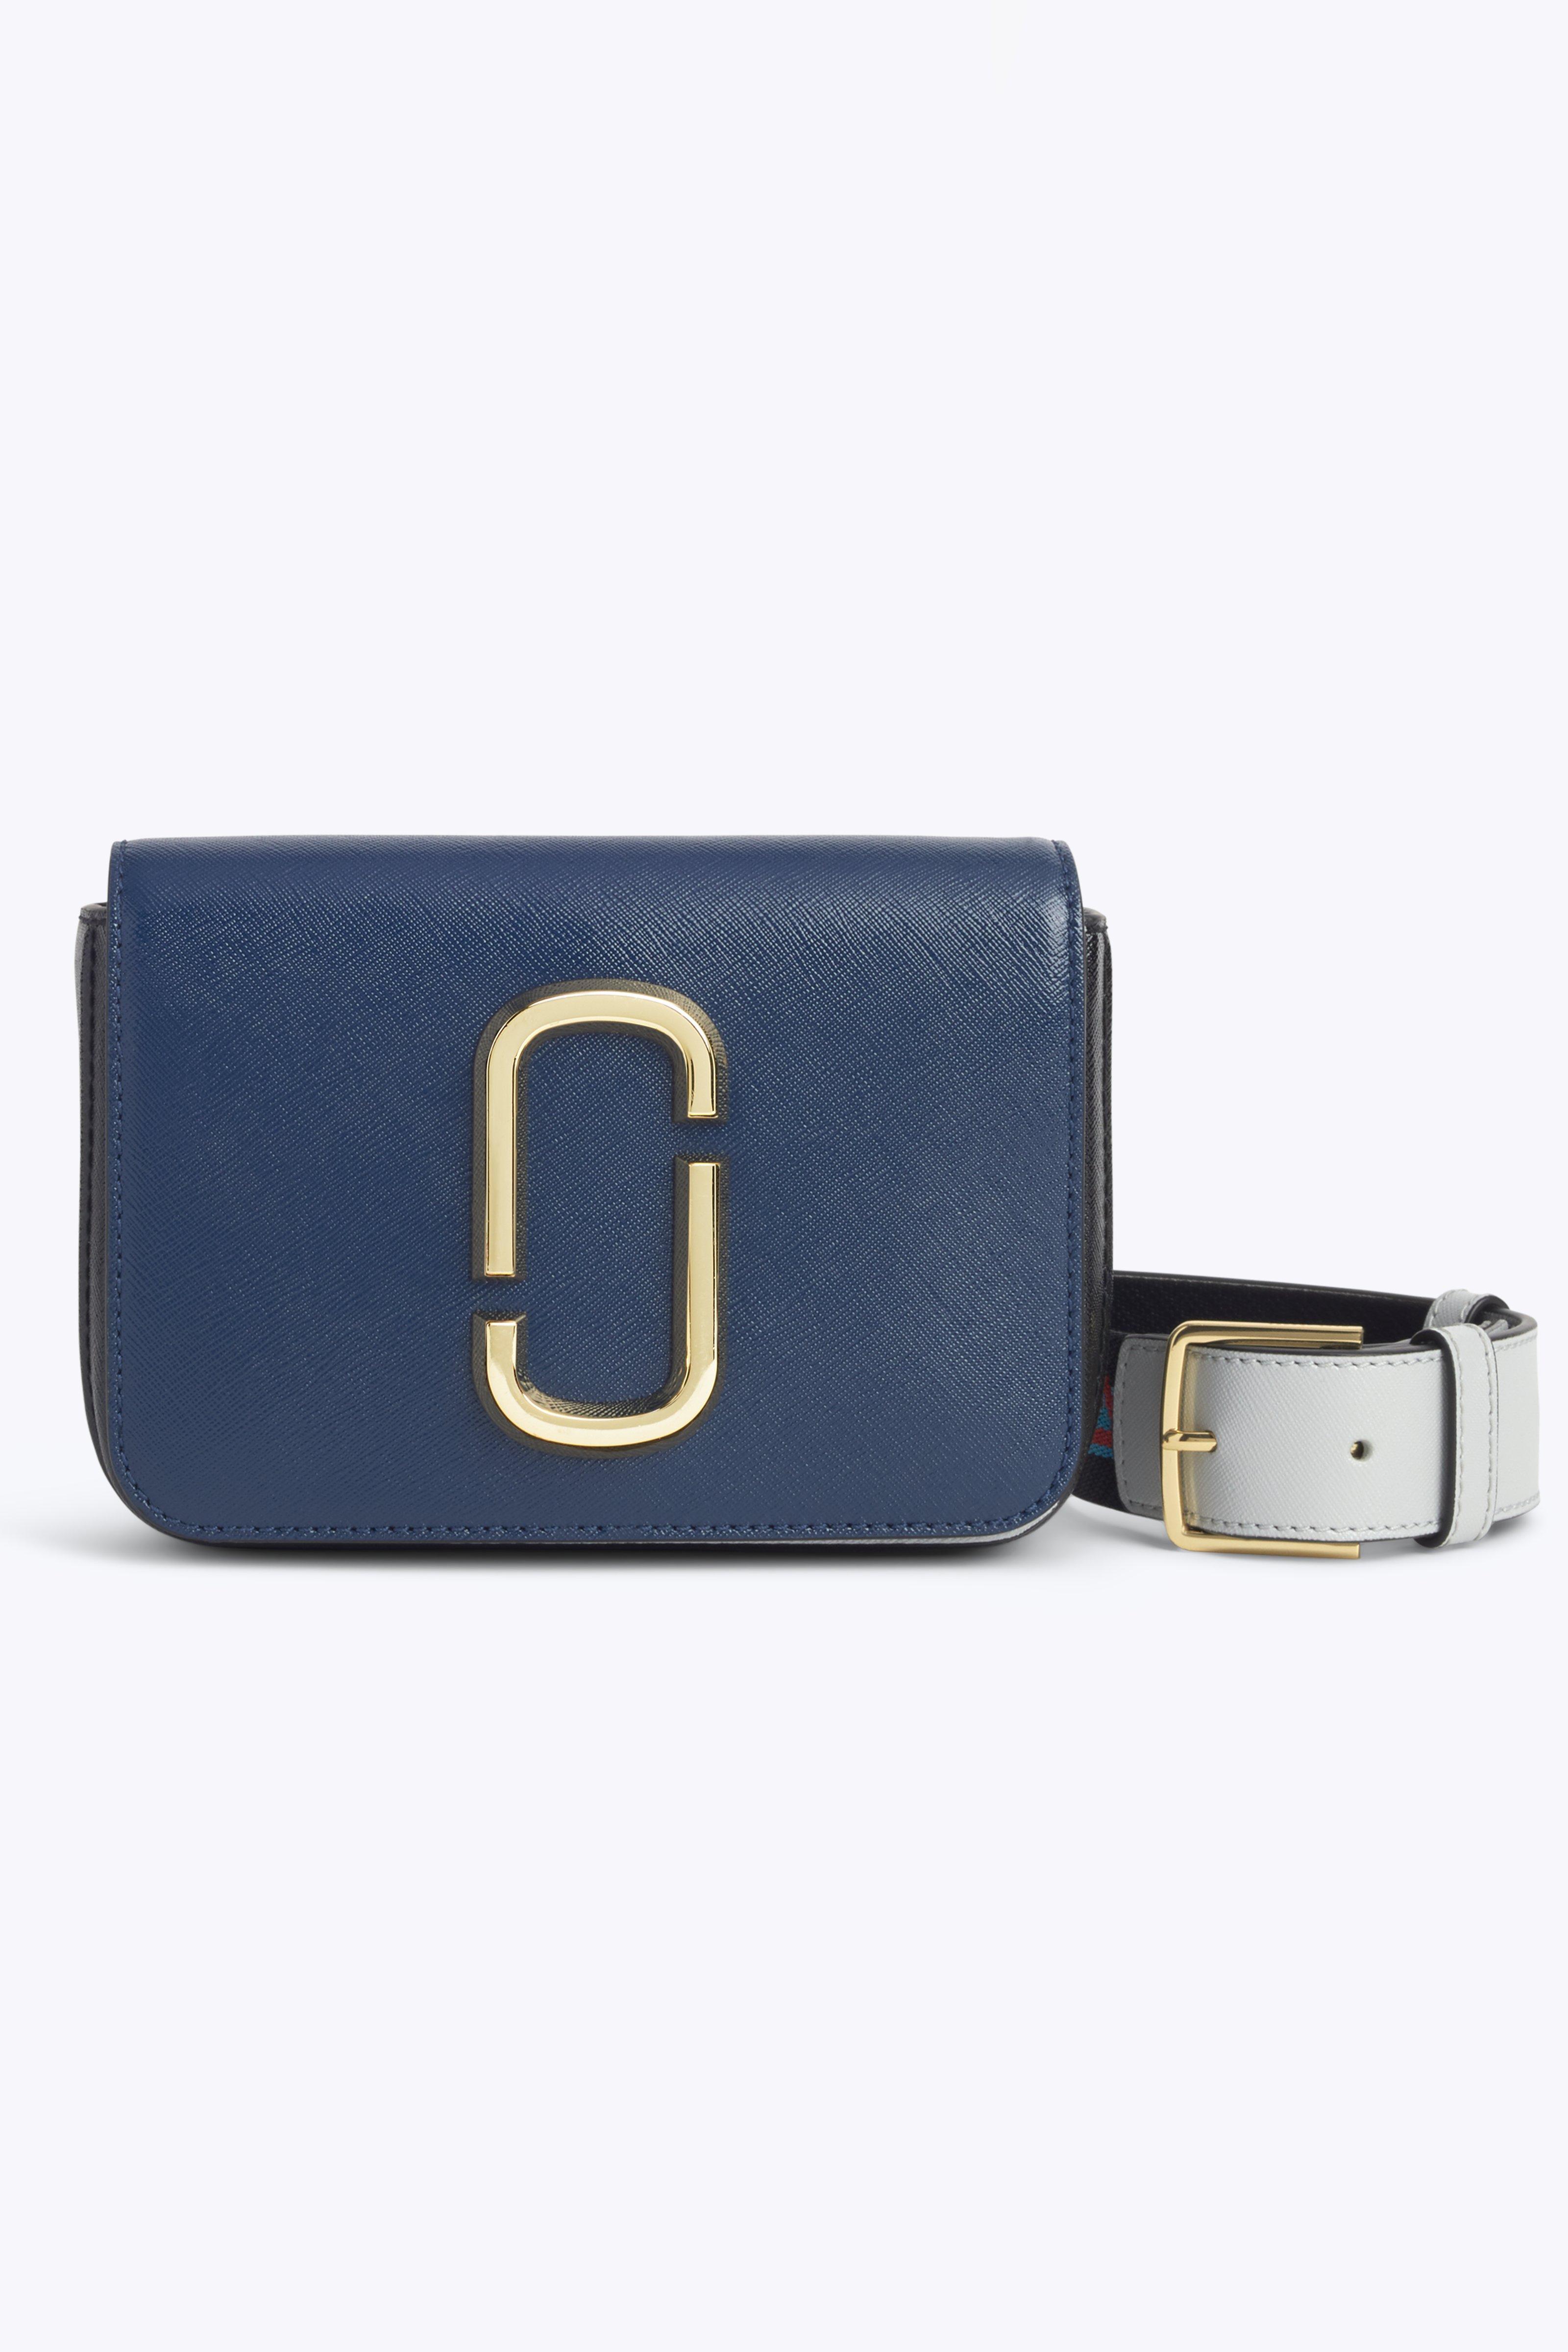 c9e3abea4a4fb Marc Jacobs Hip Shot Convertible Leather Belt Bag - Blue In Blue Sea Multi